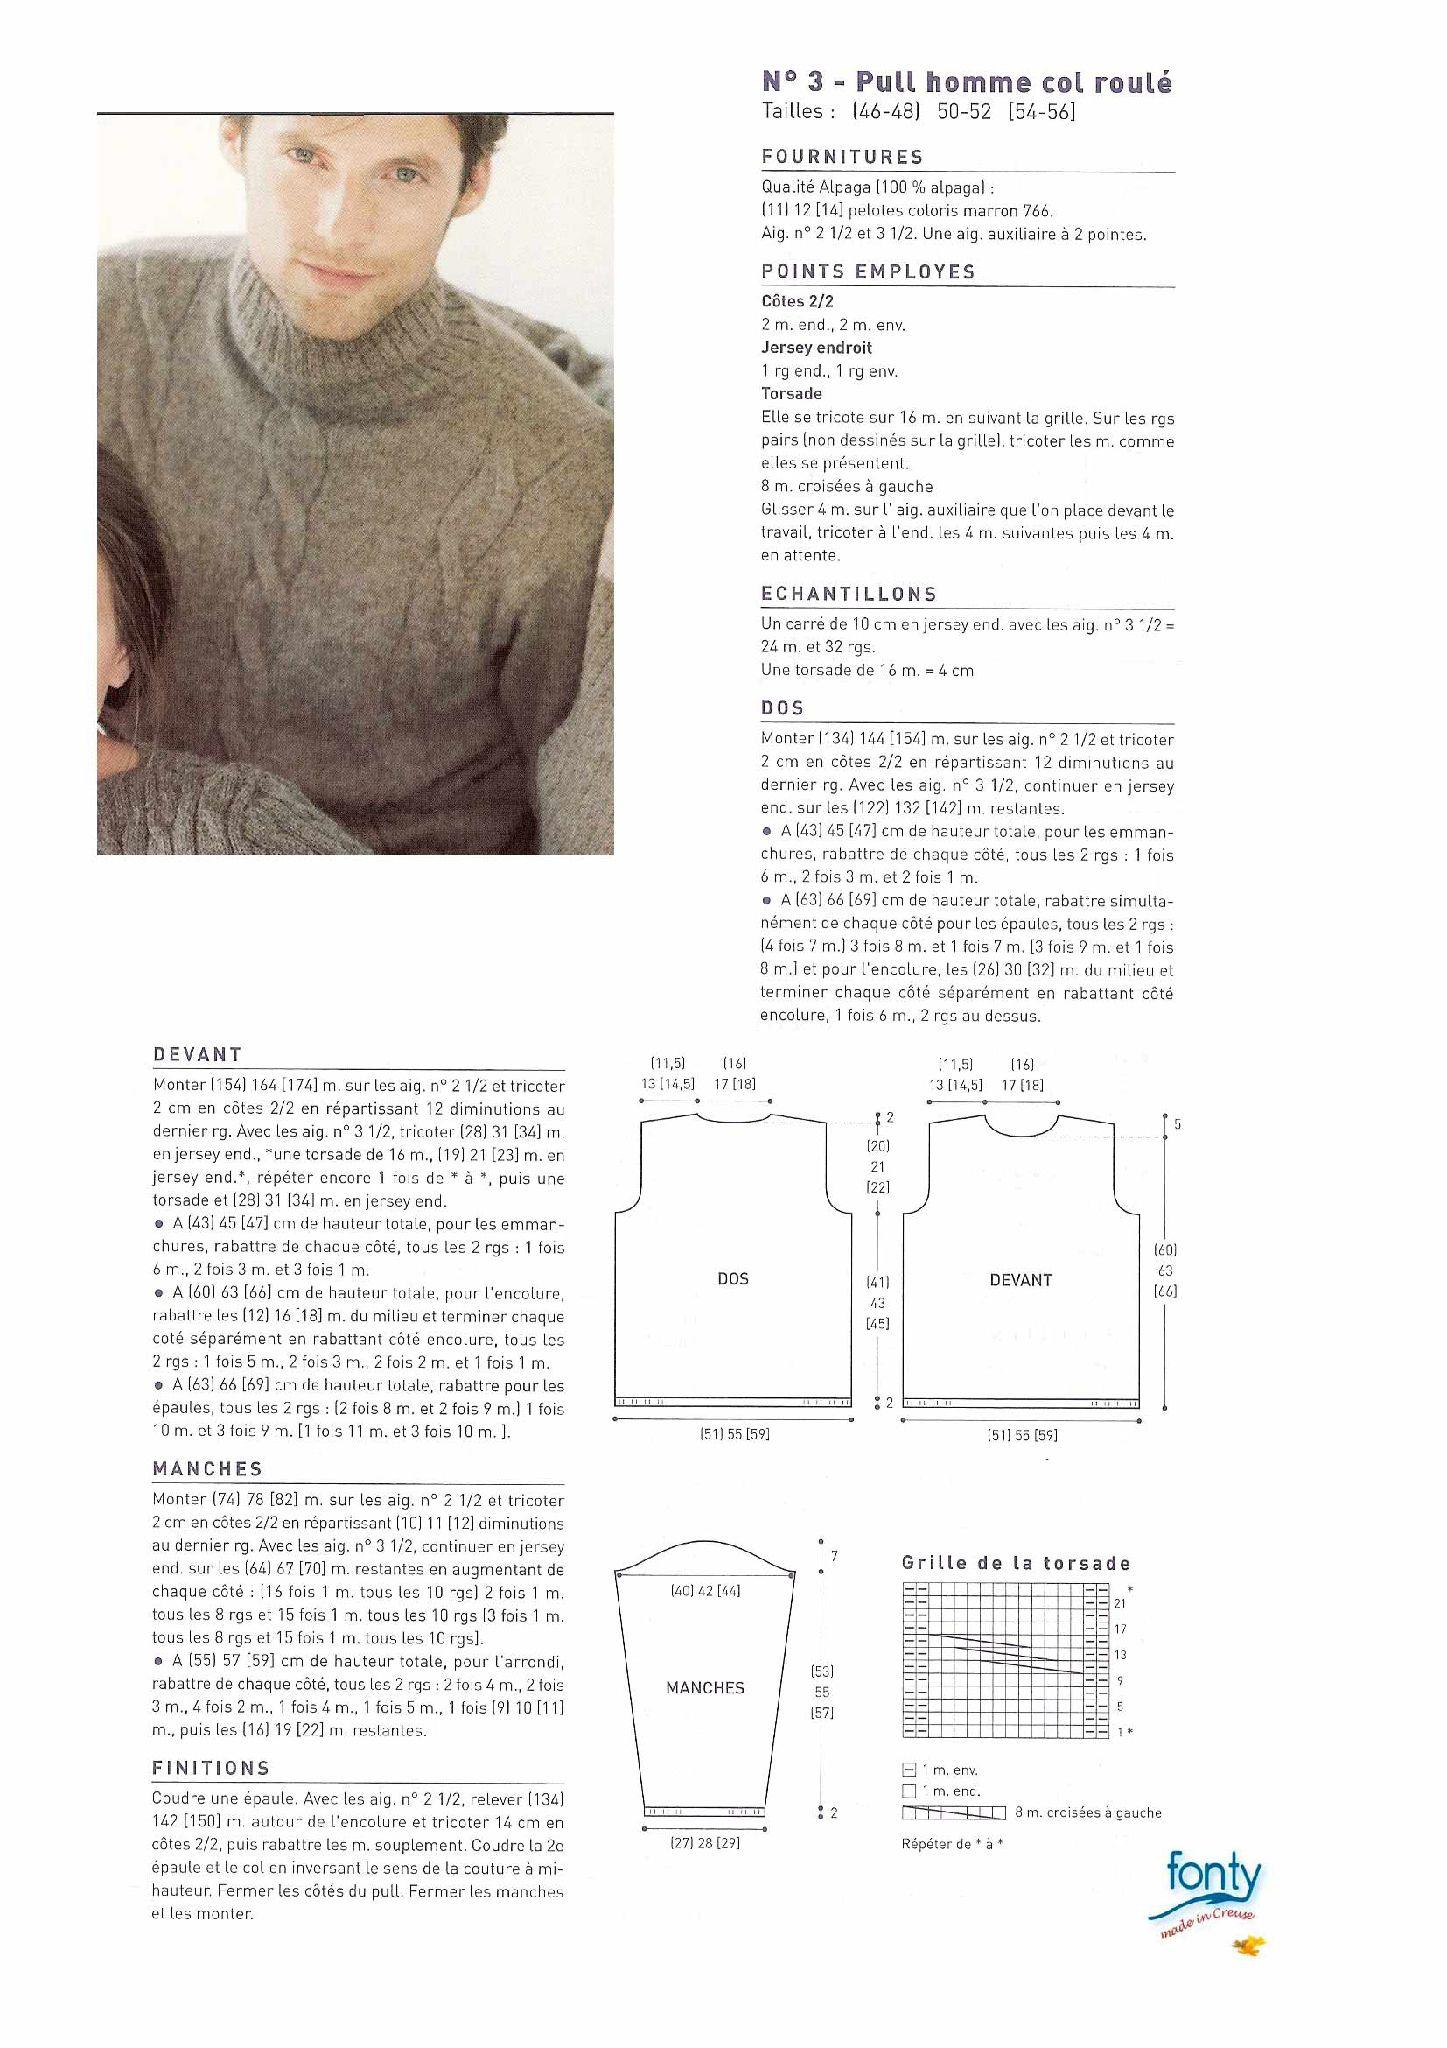 Modele tricot gratuit pull homme col roule alpaga | Tricot-Homme ...